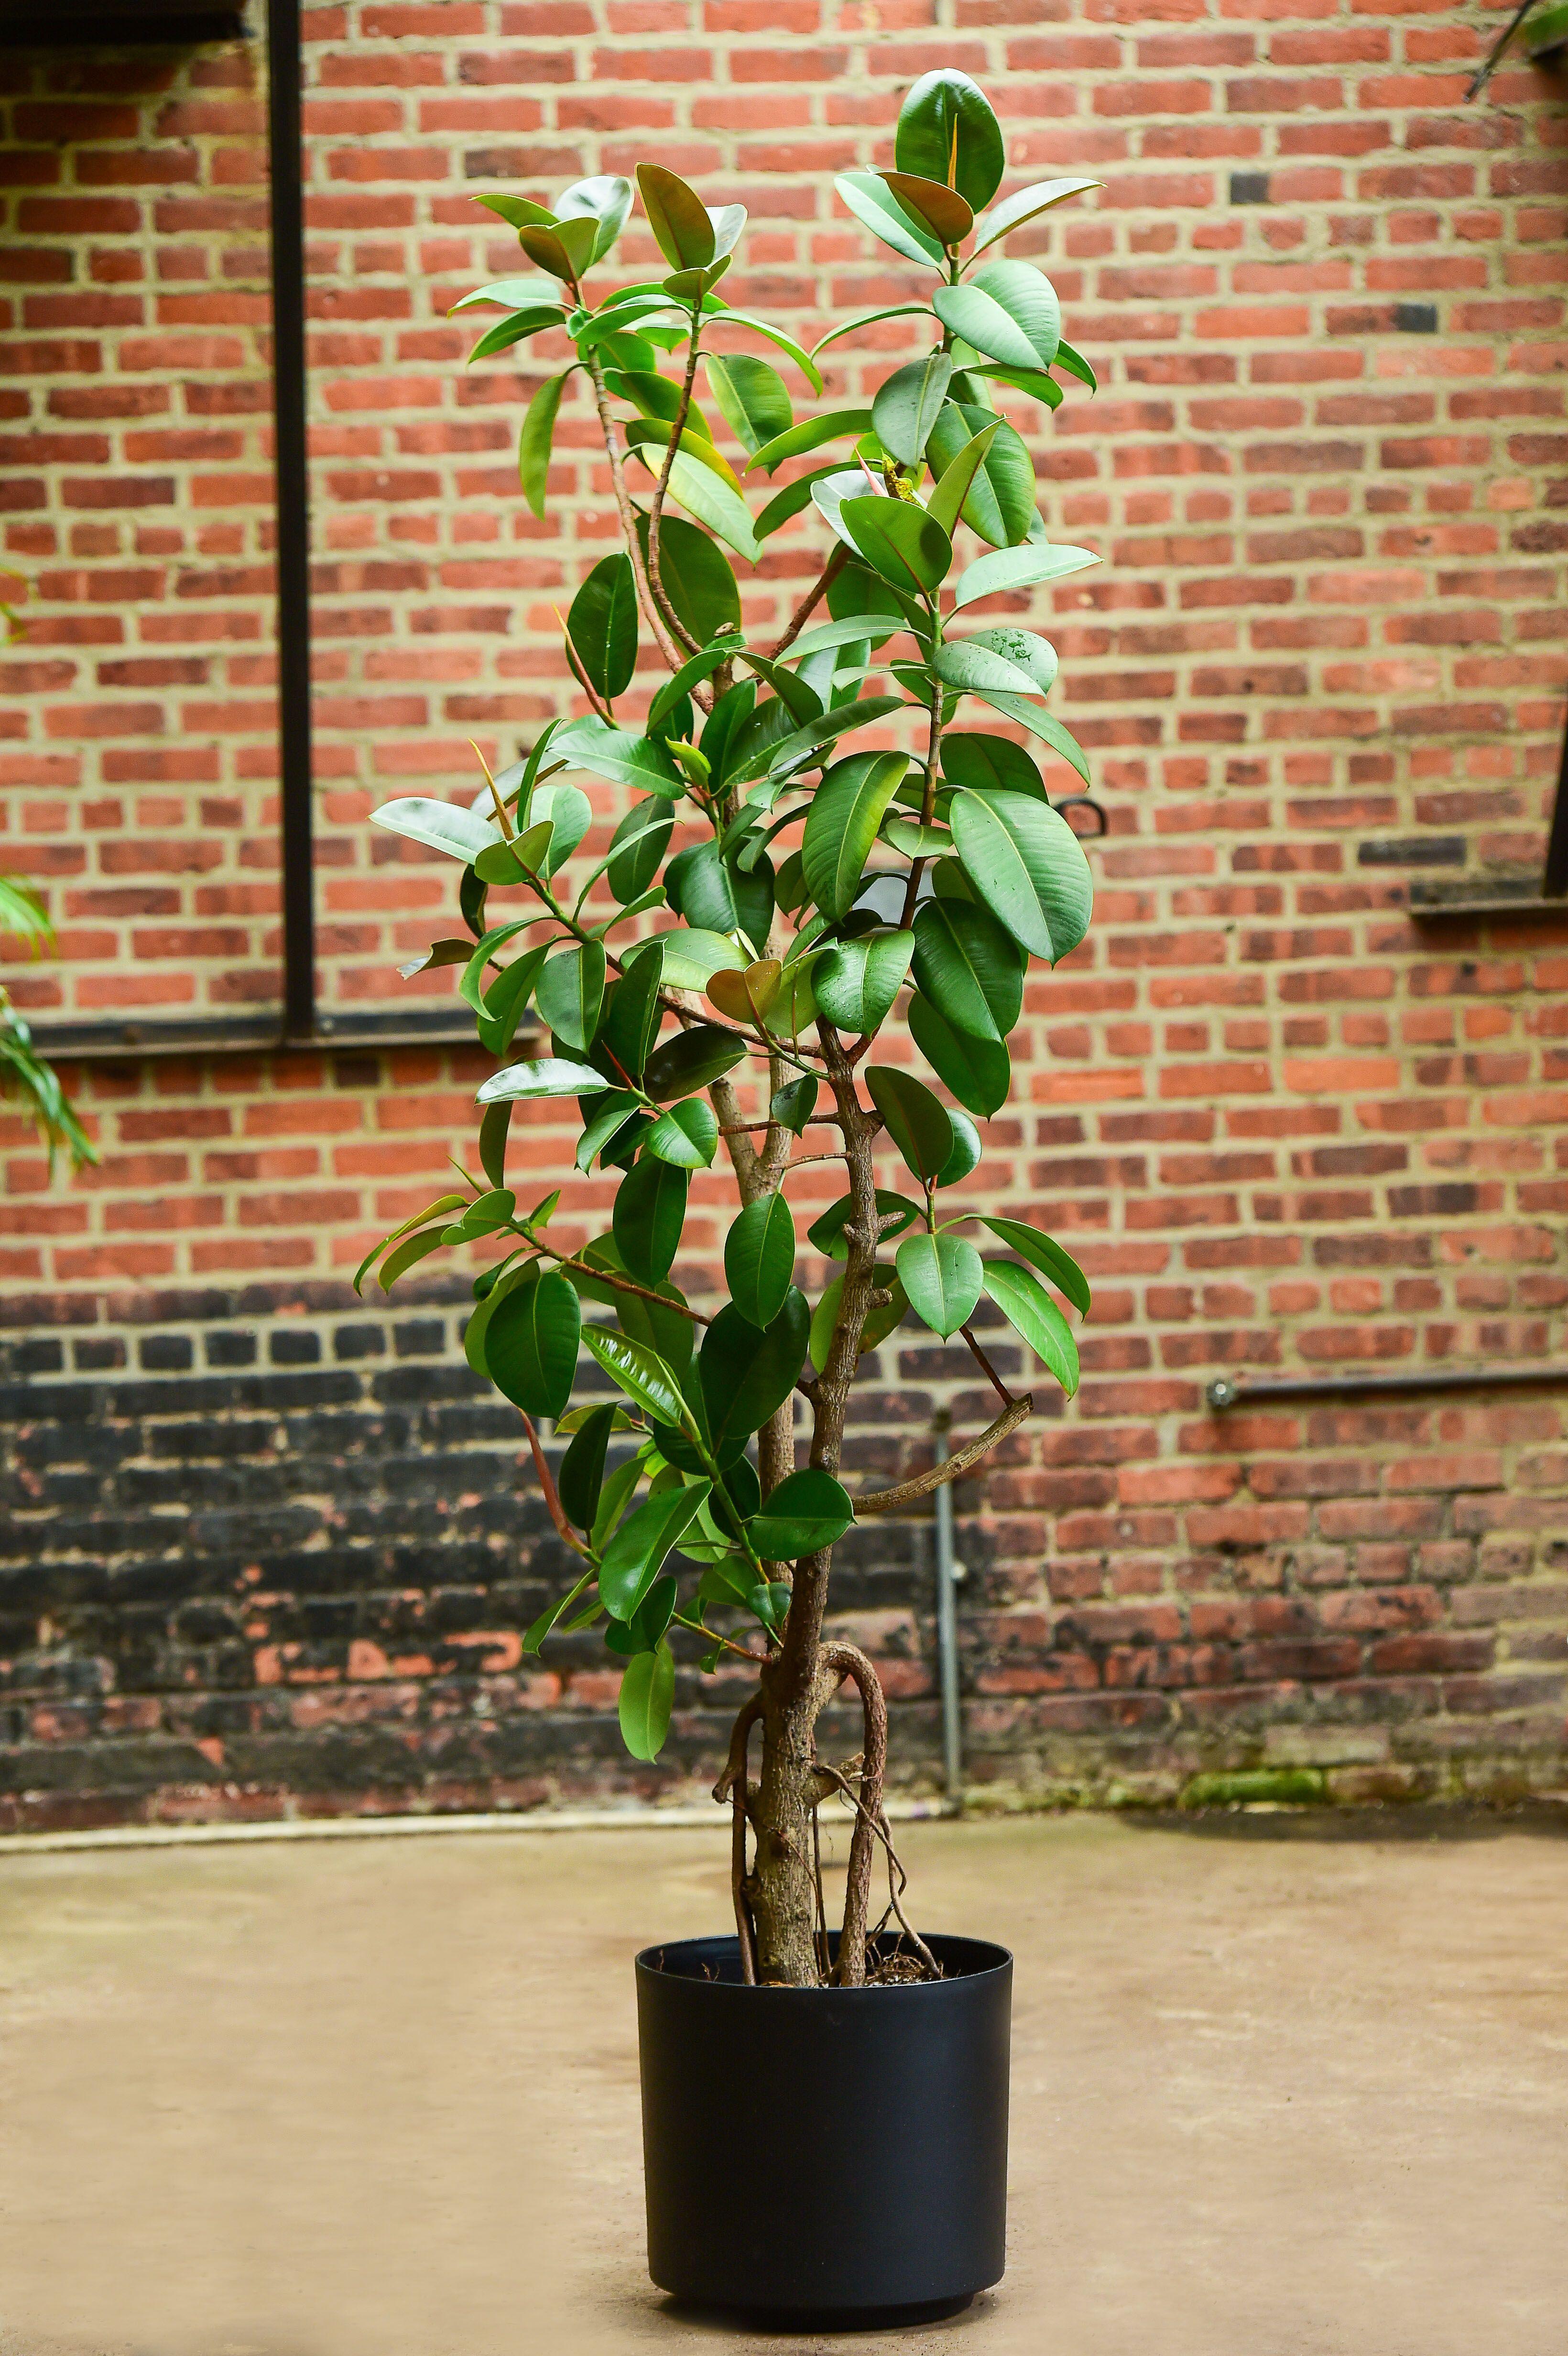 Ficus elastica (Rubber Tree Plant) Trees to plant